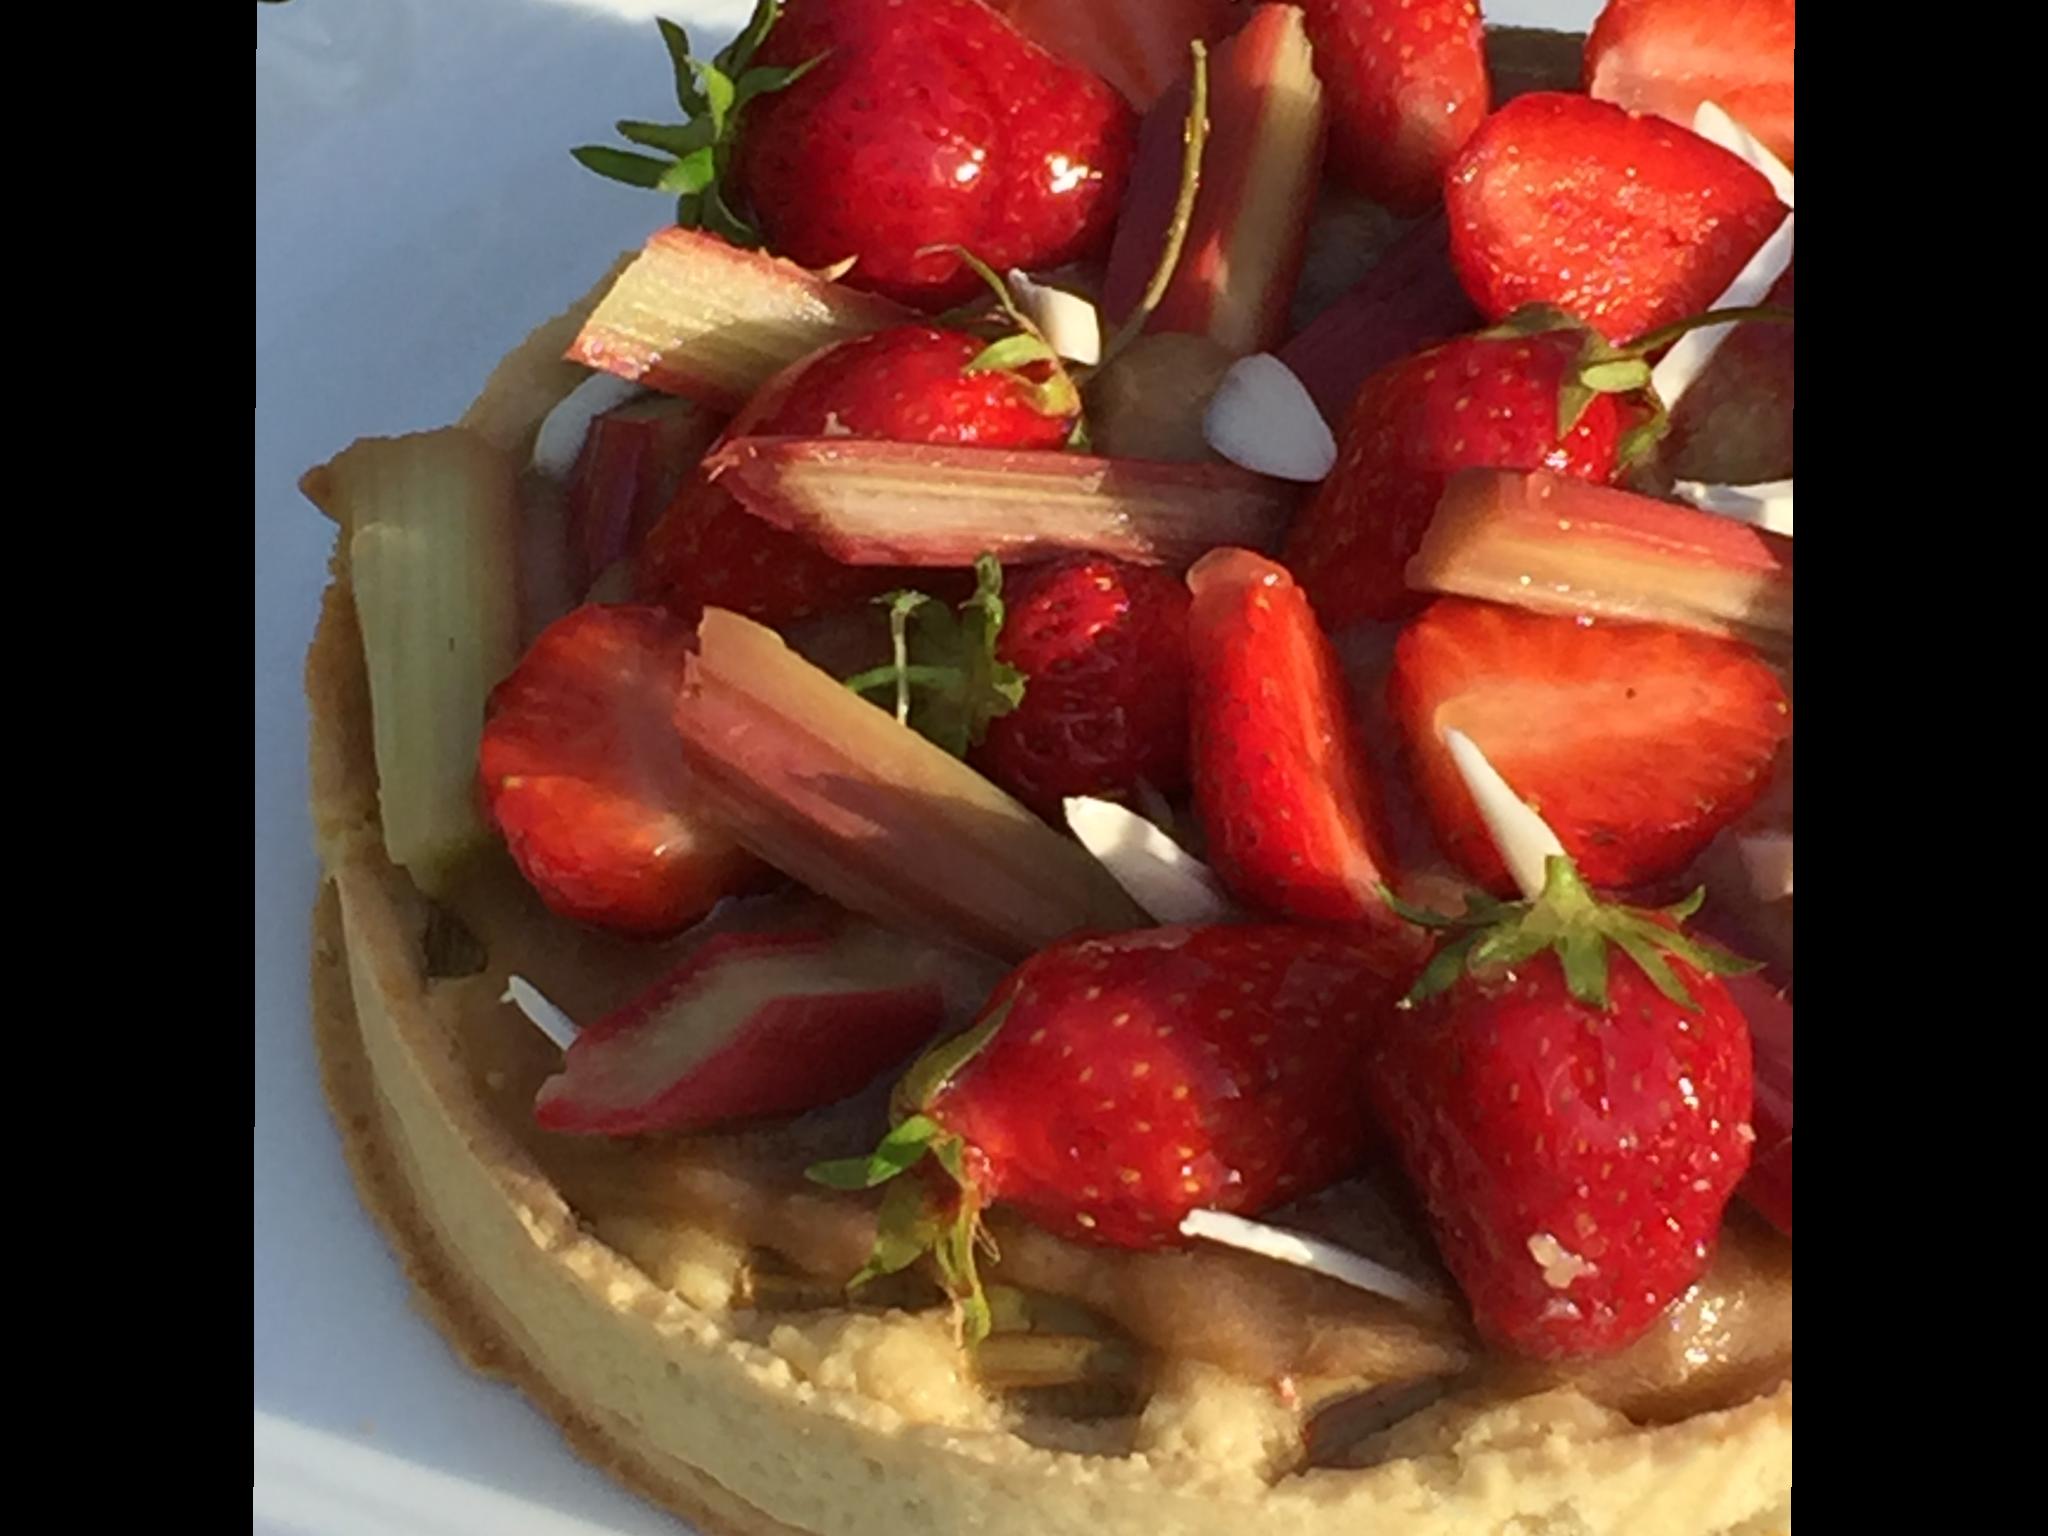 Tarte rhubarbe fraise sans gluten, recette de Claire Heiztler